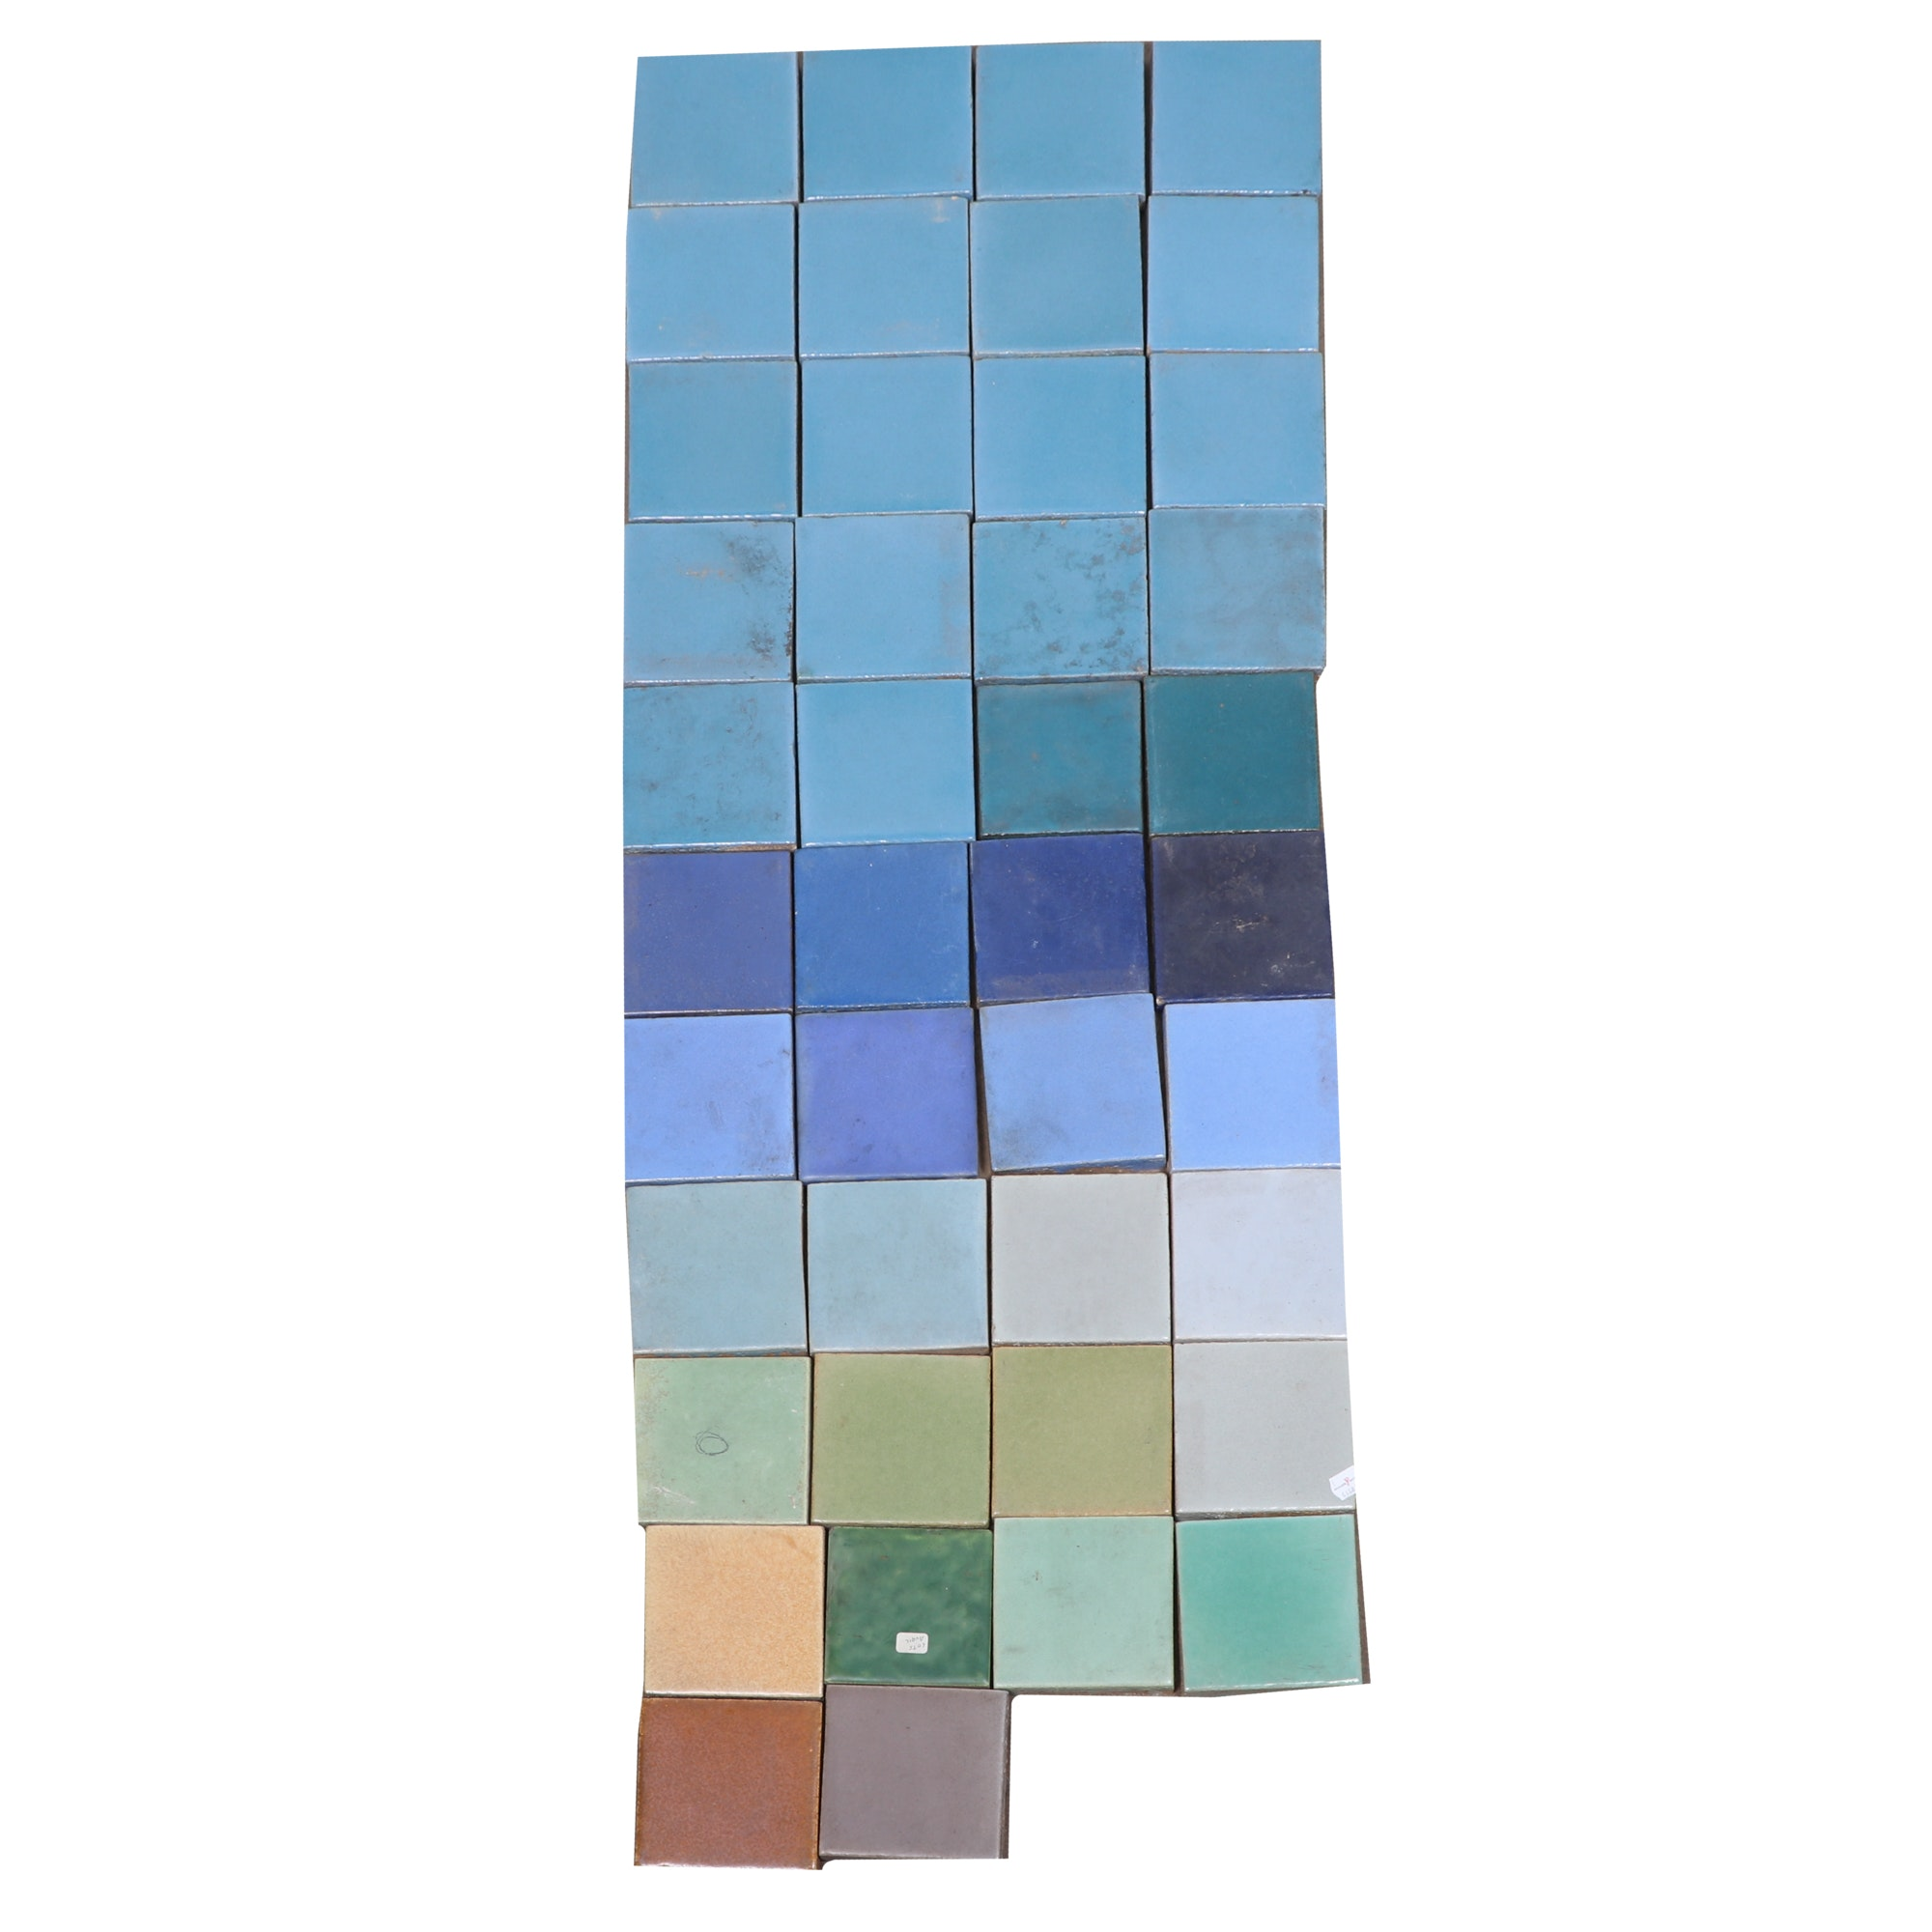 Flint Faïence Tile Company Earthenware Tiles, Early 20th Century